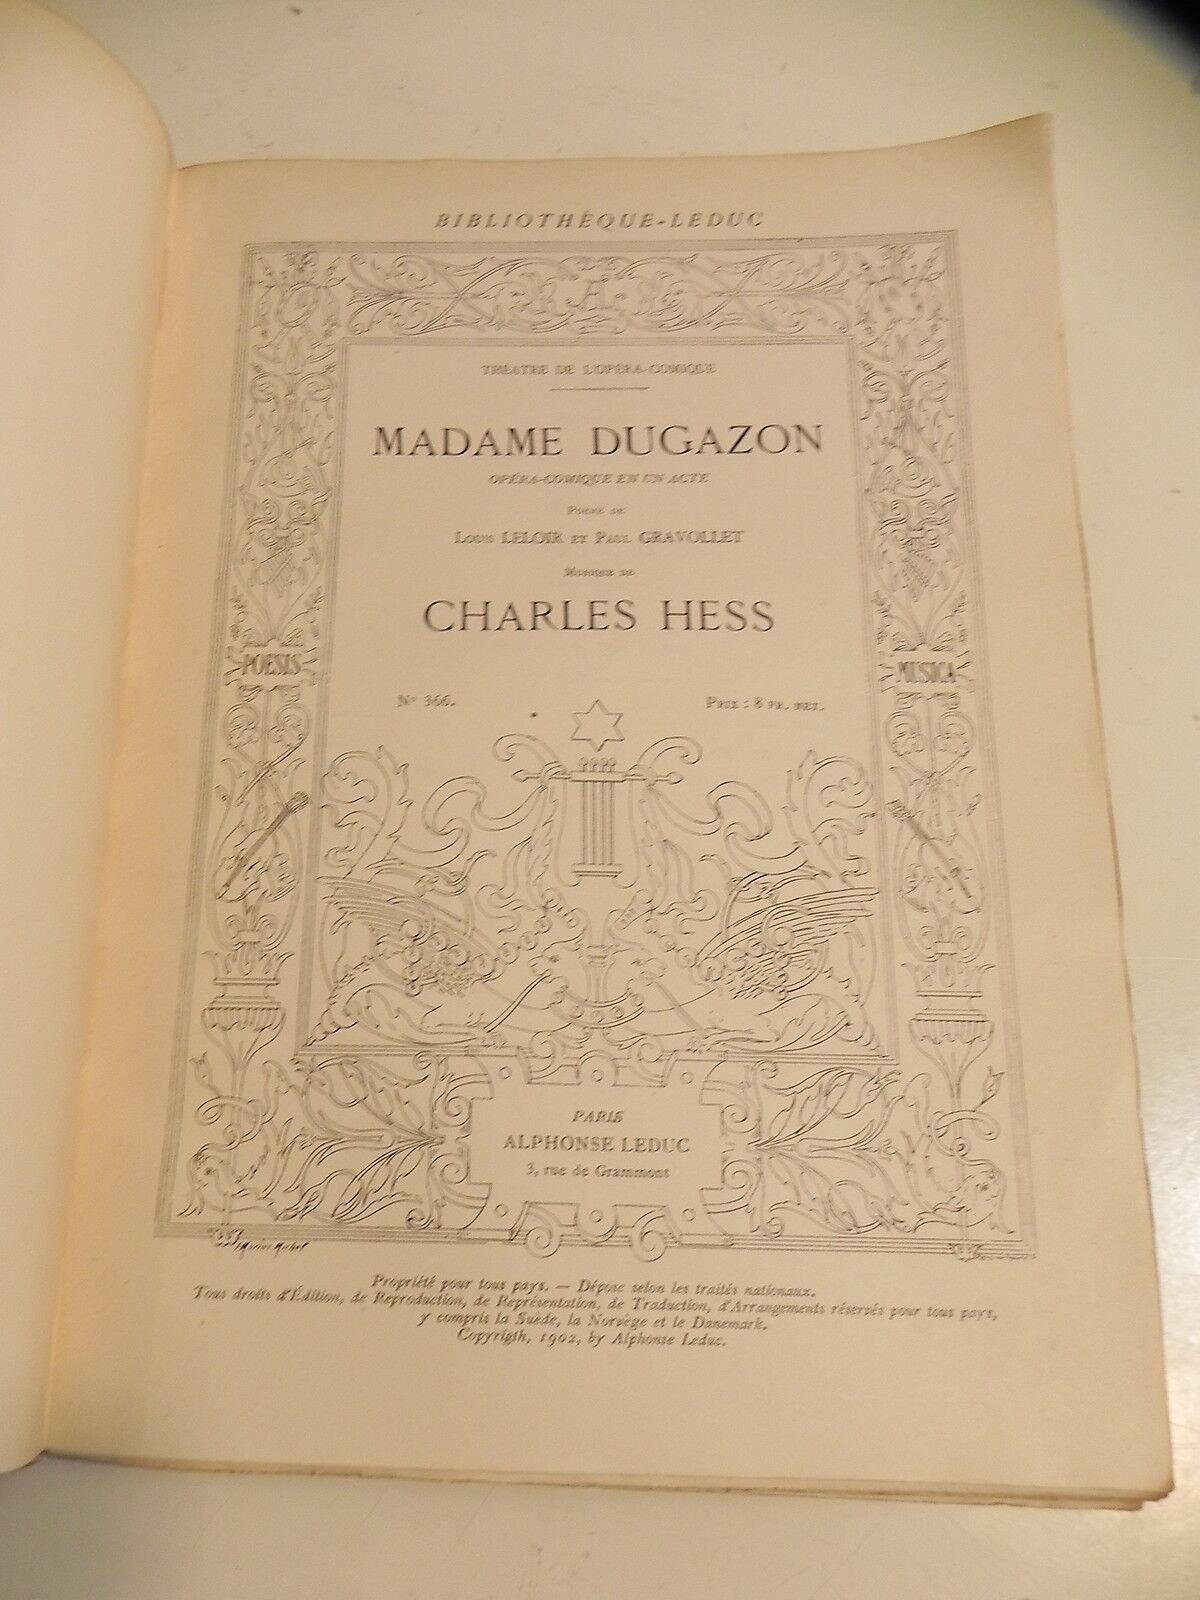 HESS Charles MADAME DUGAZON Opéra comique Partition sheet music score Leduc 1902